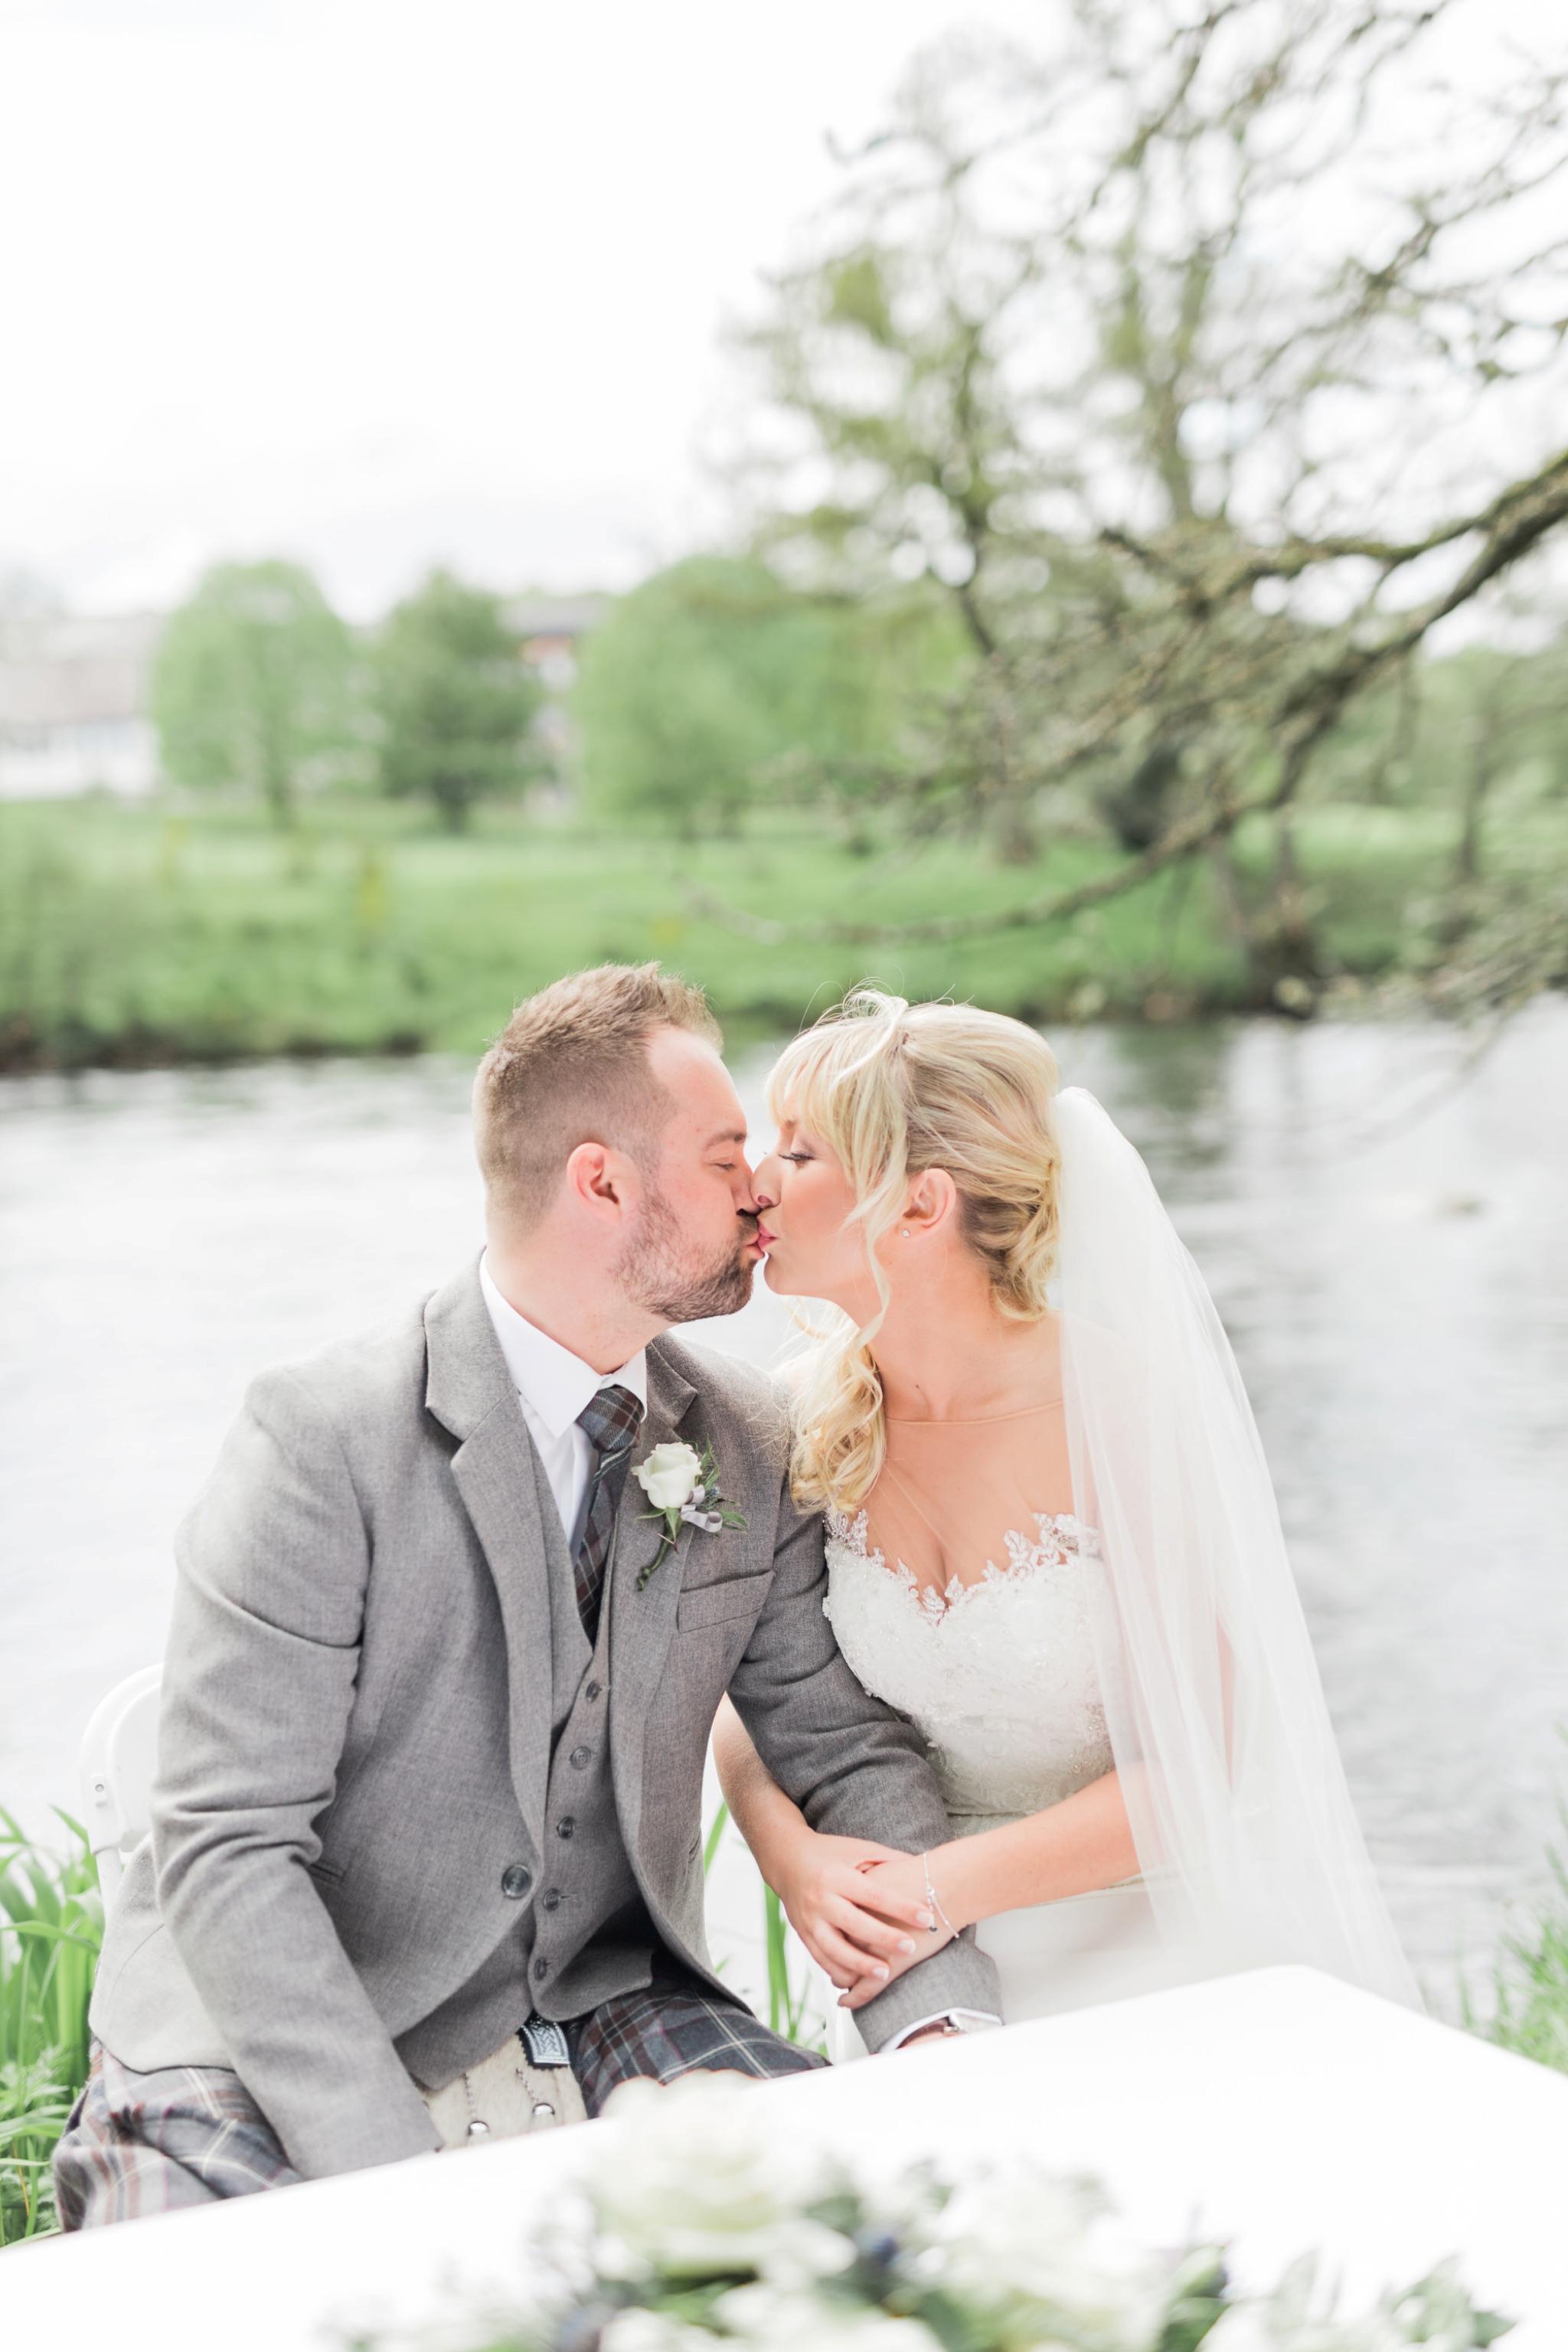 Suzanne_li_photography_Roman_camp_wedding_0014.jpg